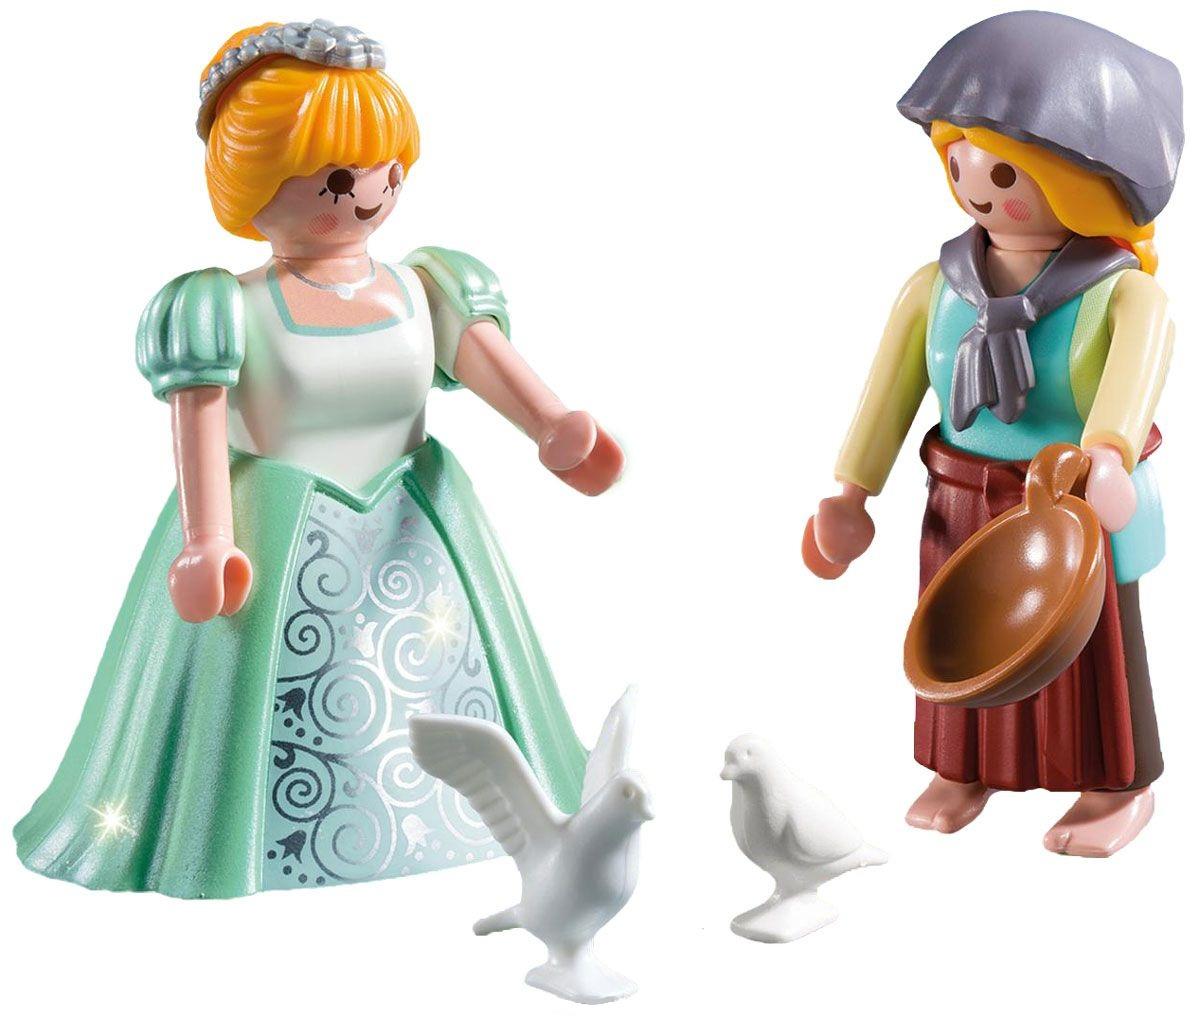 ДУО: Принцесса и служанкаПринцессы и Феи<br>ДУО: Принцесса и служанка<br>